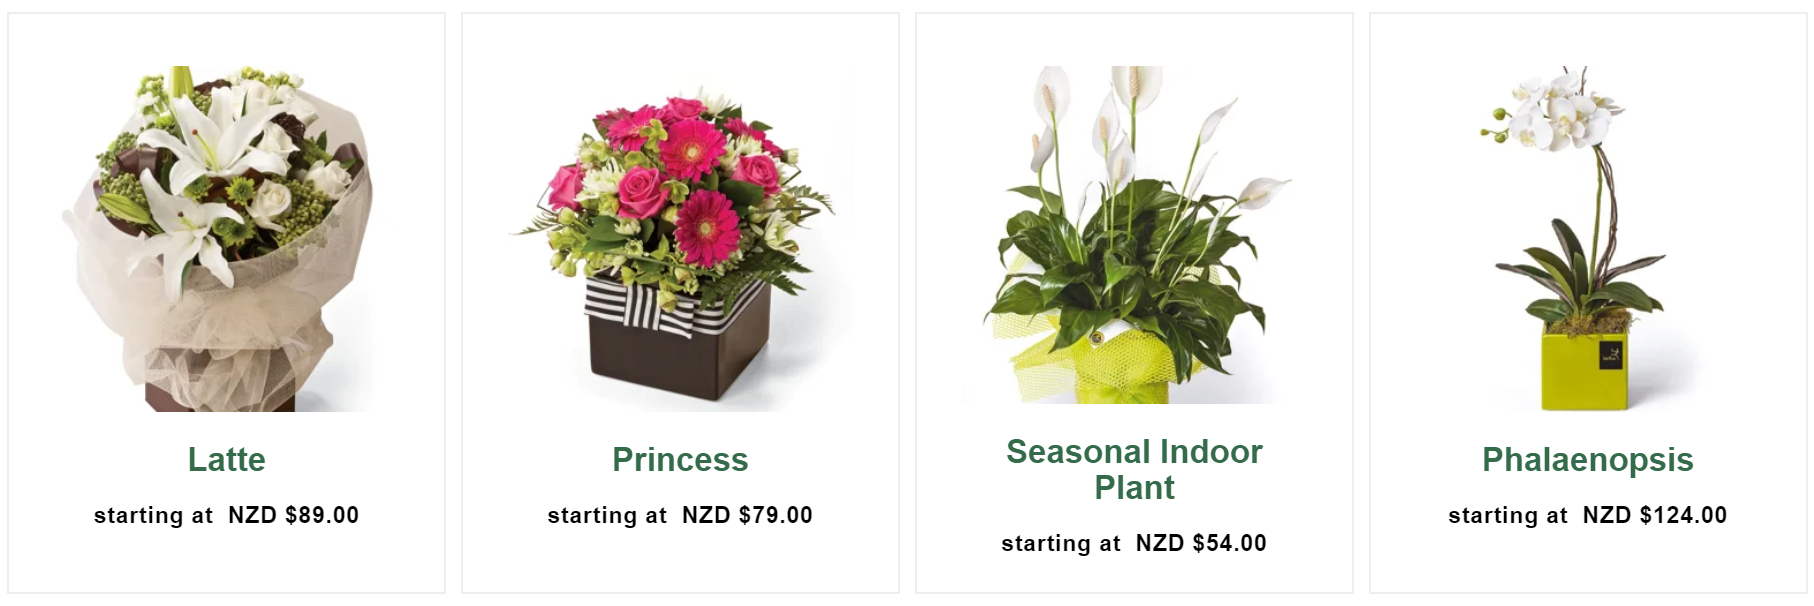 About Interflora NZ